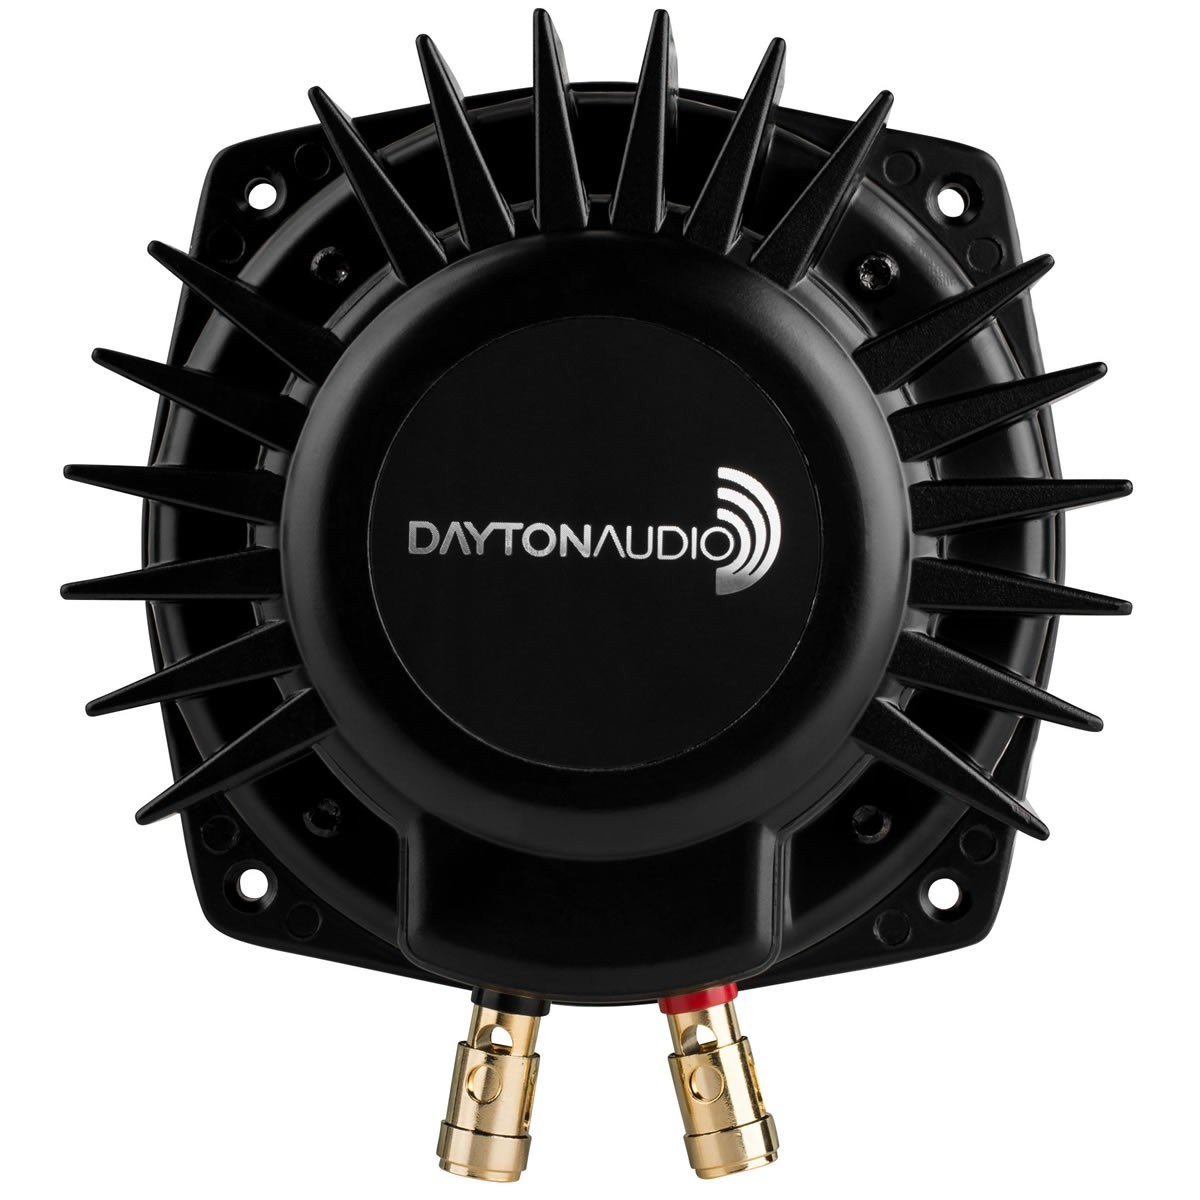 DAYTON AUDIO BST-1 Bass Shaker Exciter 50W 4 Ohm